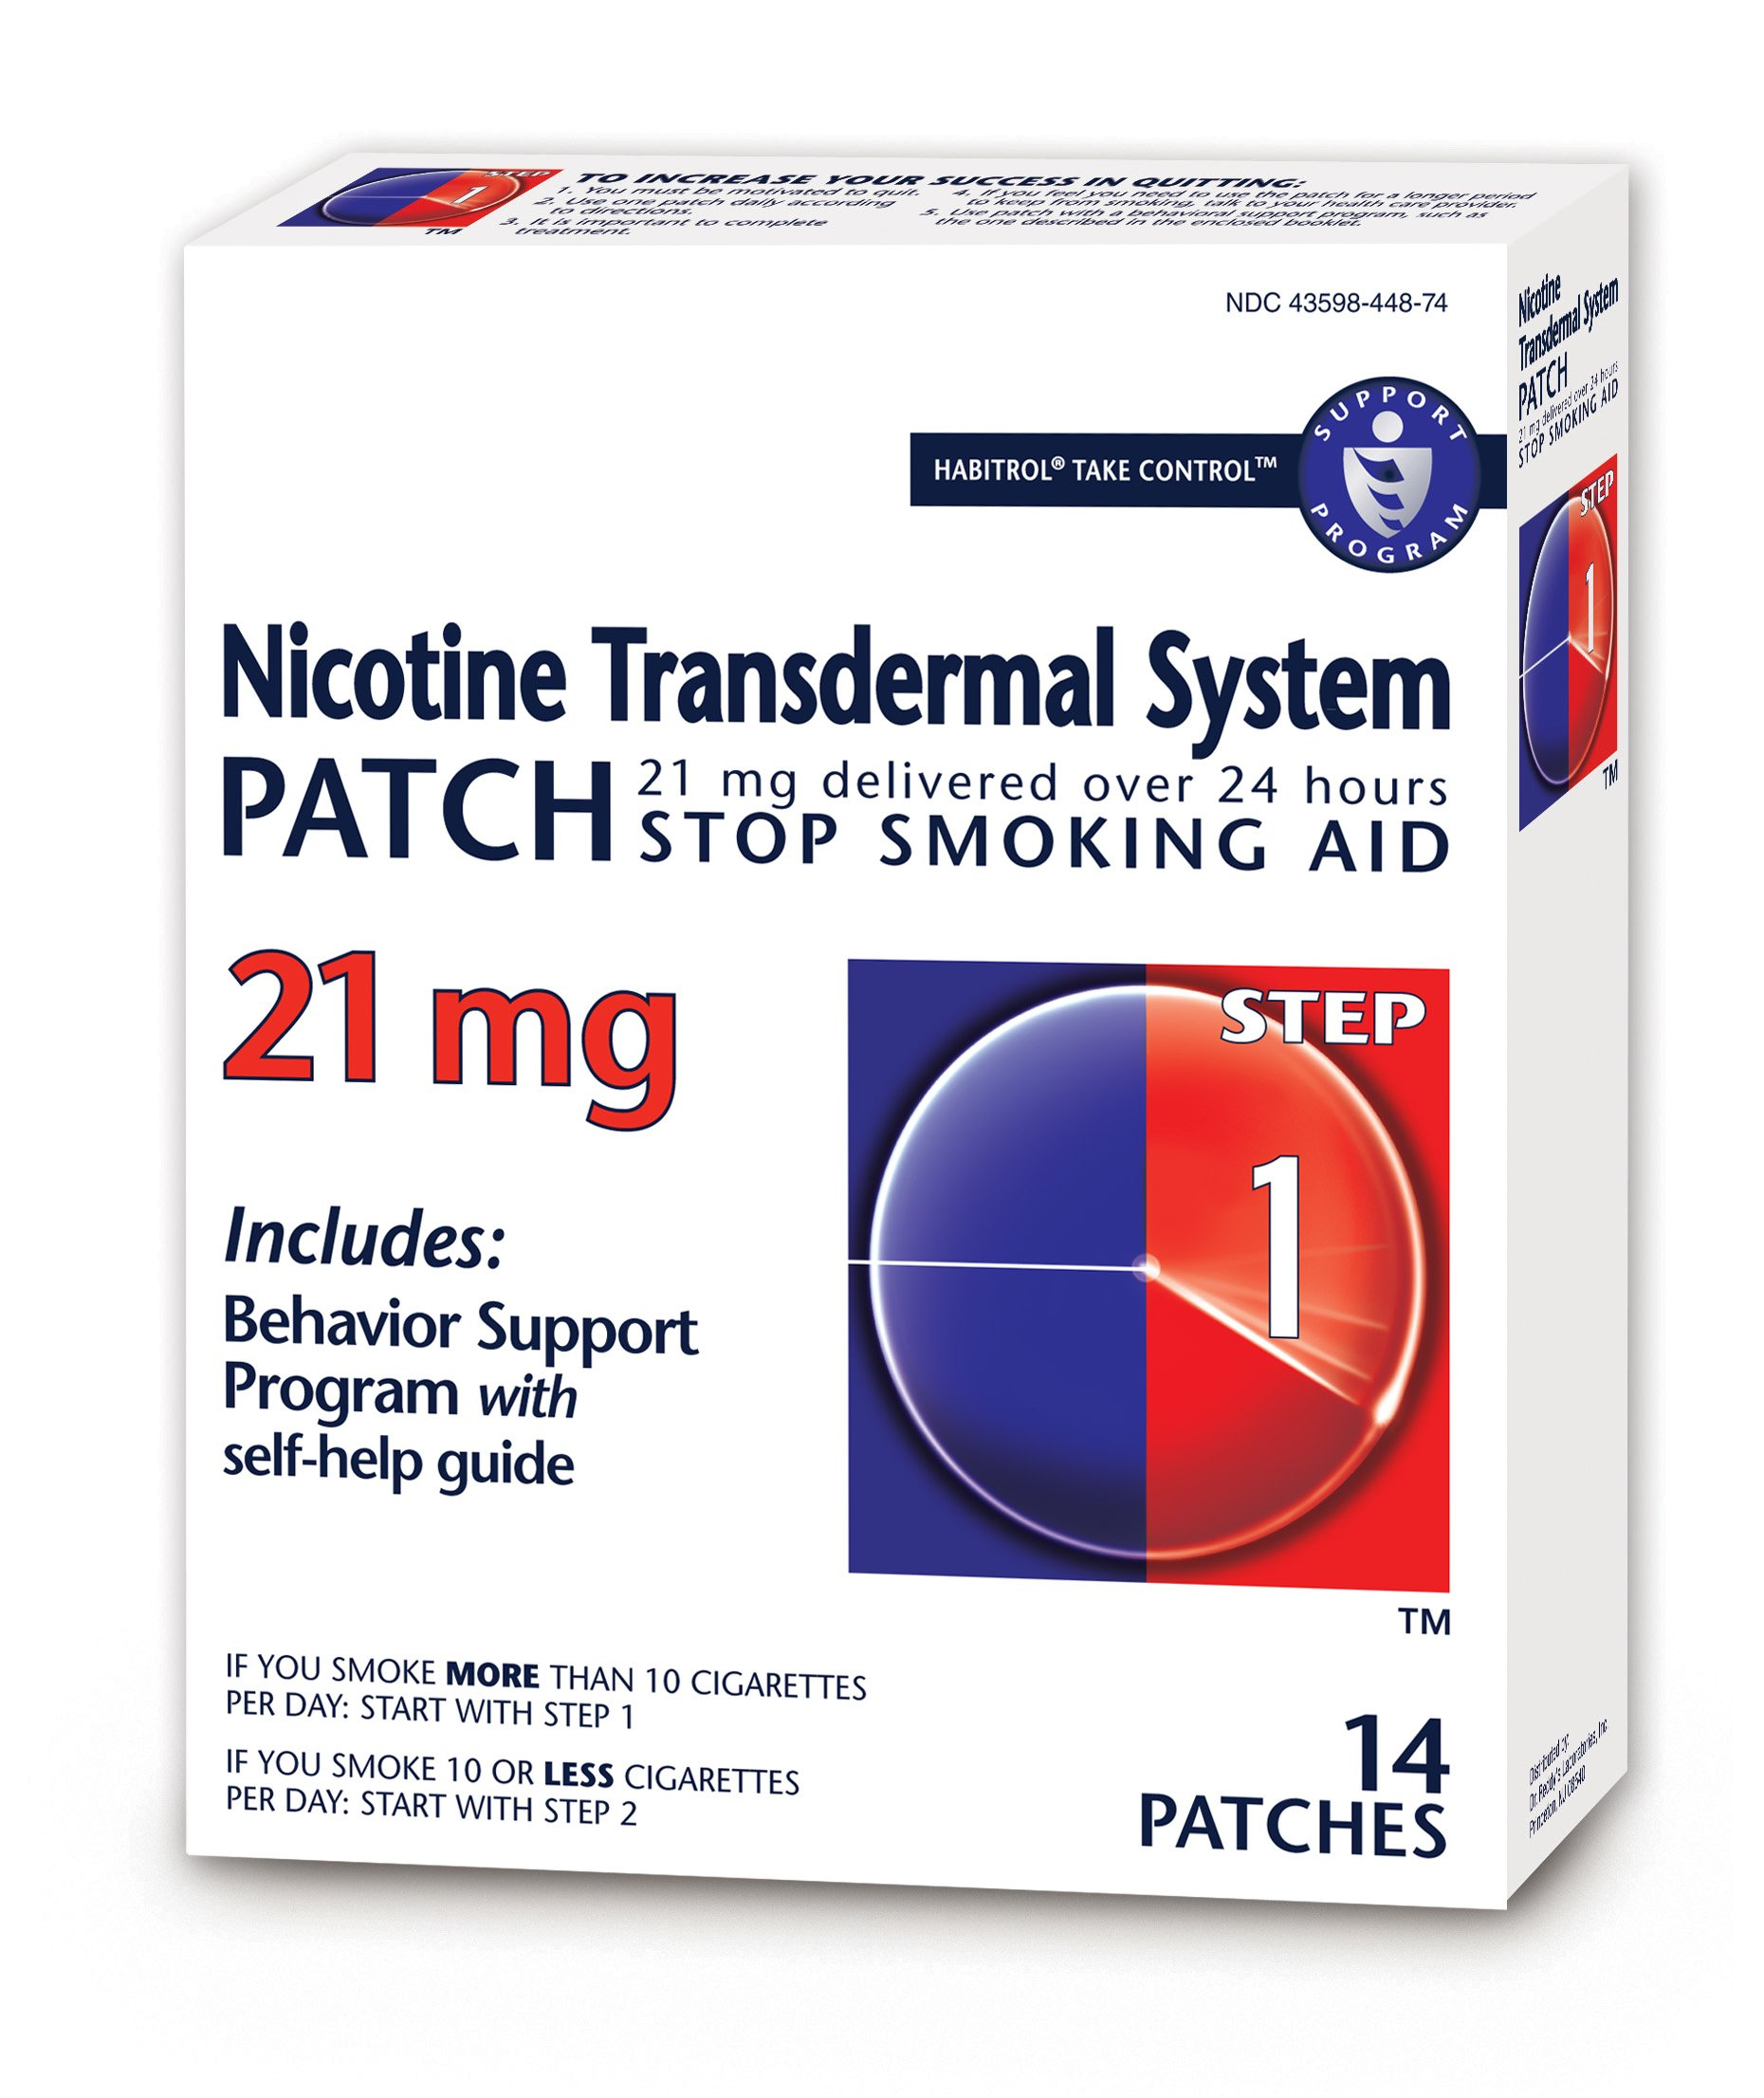 Habitrol Nicotine Transdermal System Patch | Stop Smoking Aid | Step 1 (21 mg) | 14 Patches (2 Week Kit)